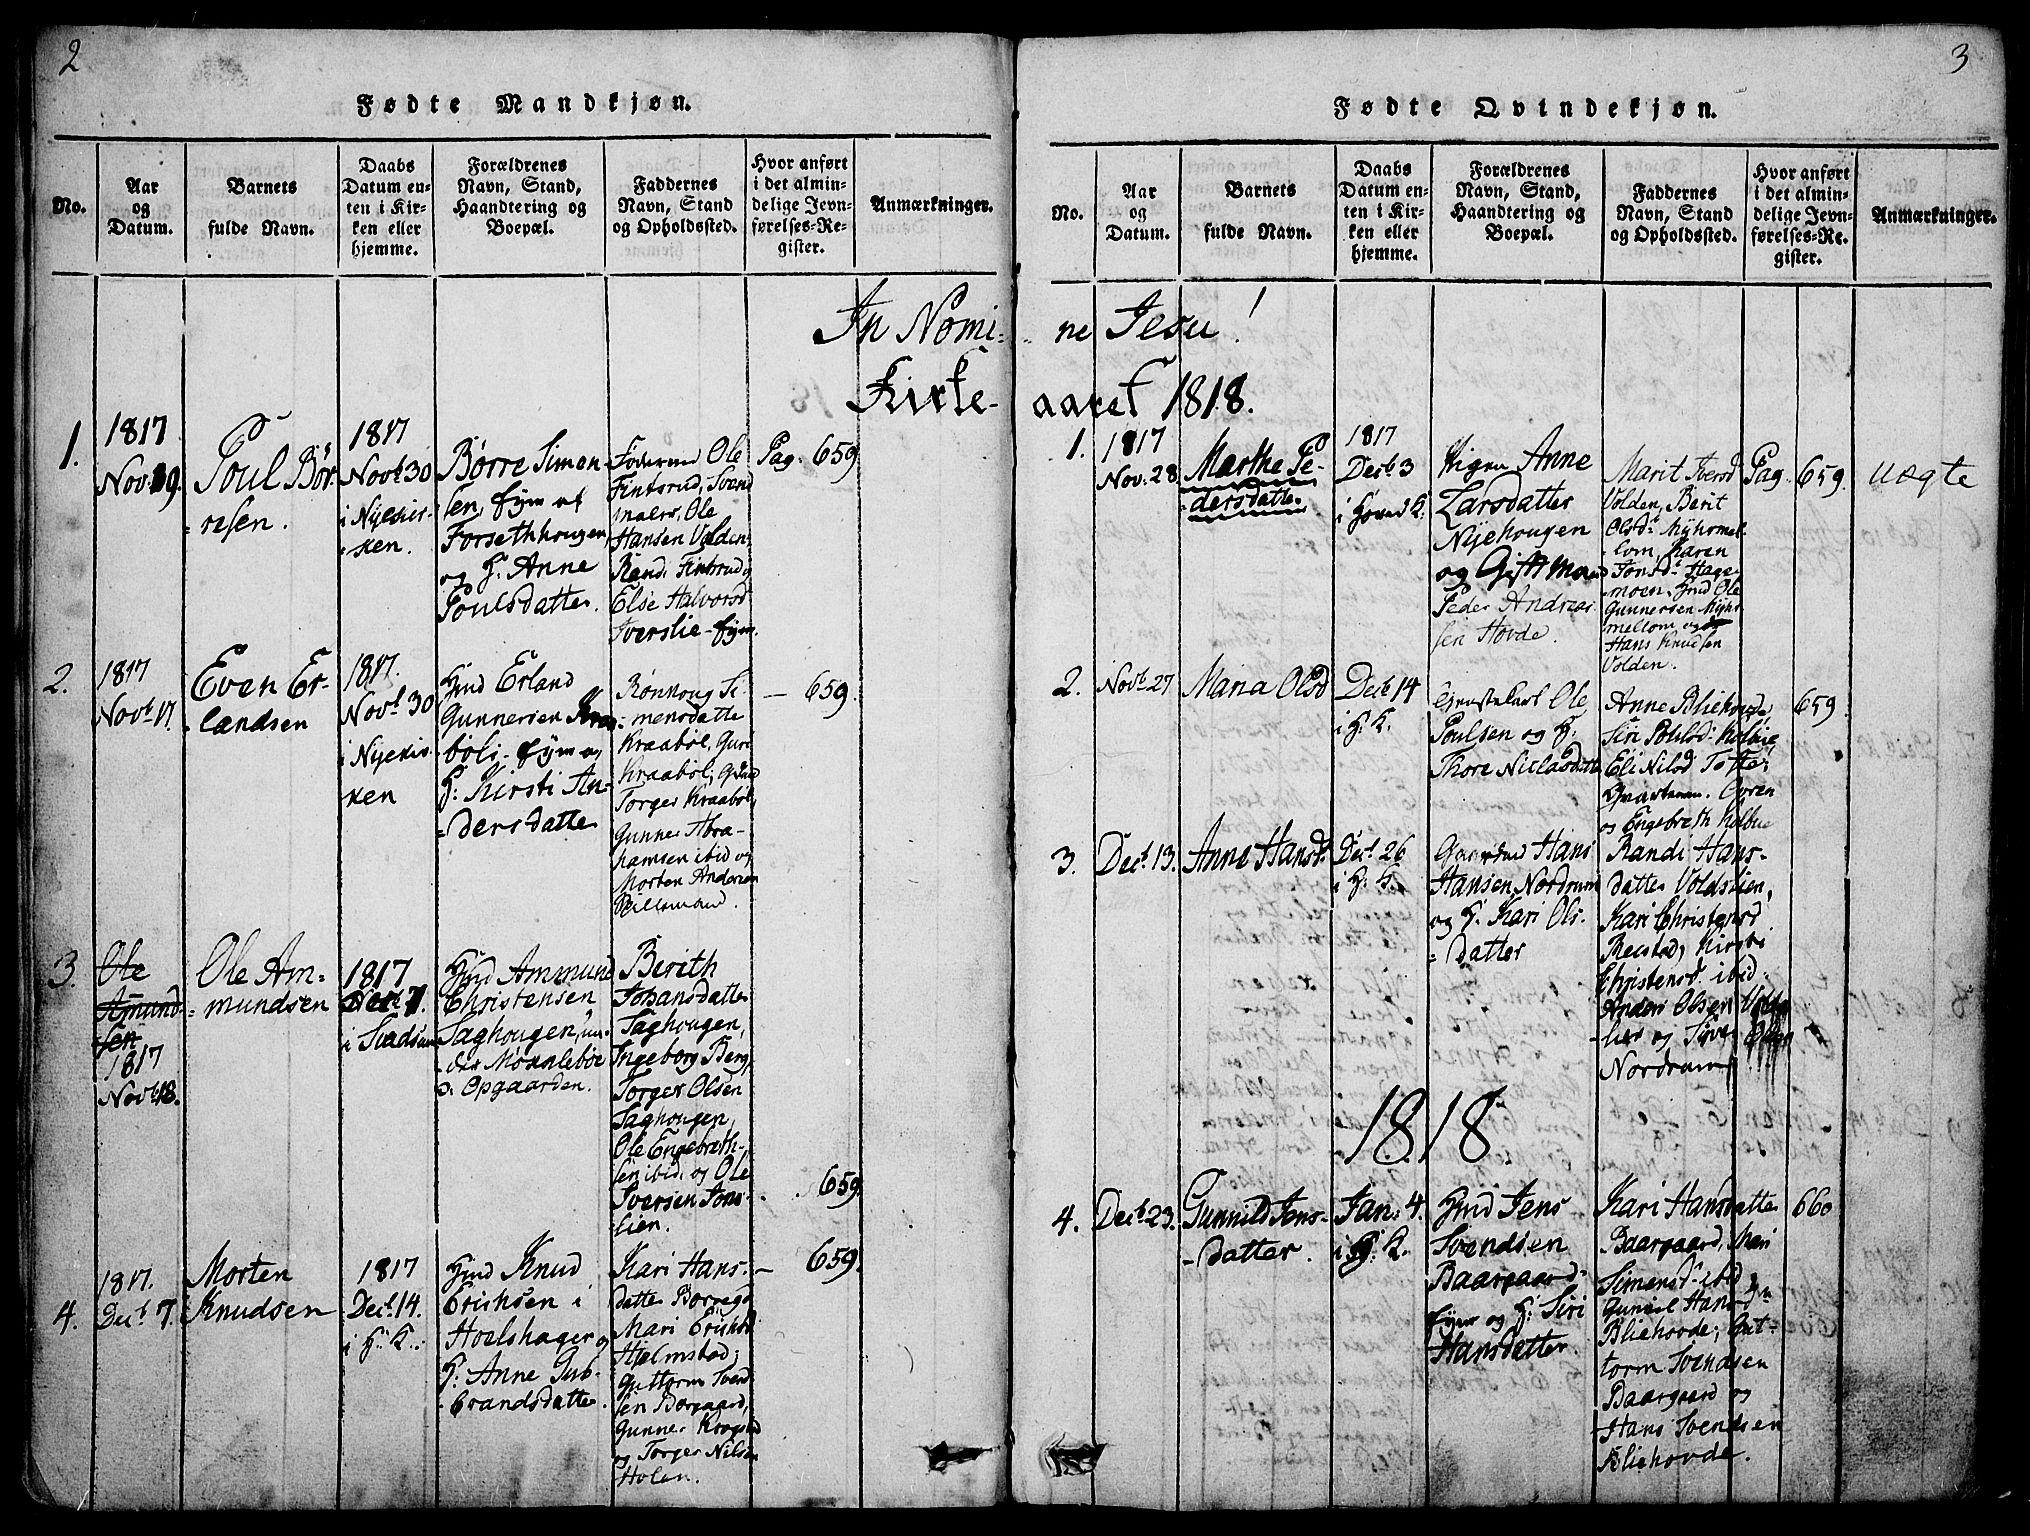 SAH, Gausdal prestekontor, Ministerialbok nr. 5, 1817-1829, s. 2-3